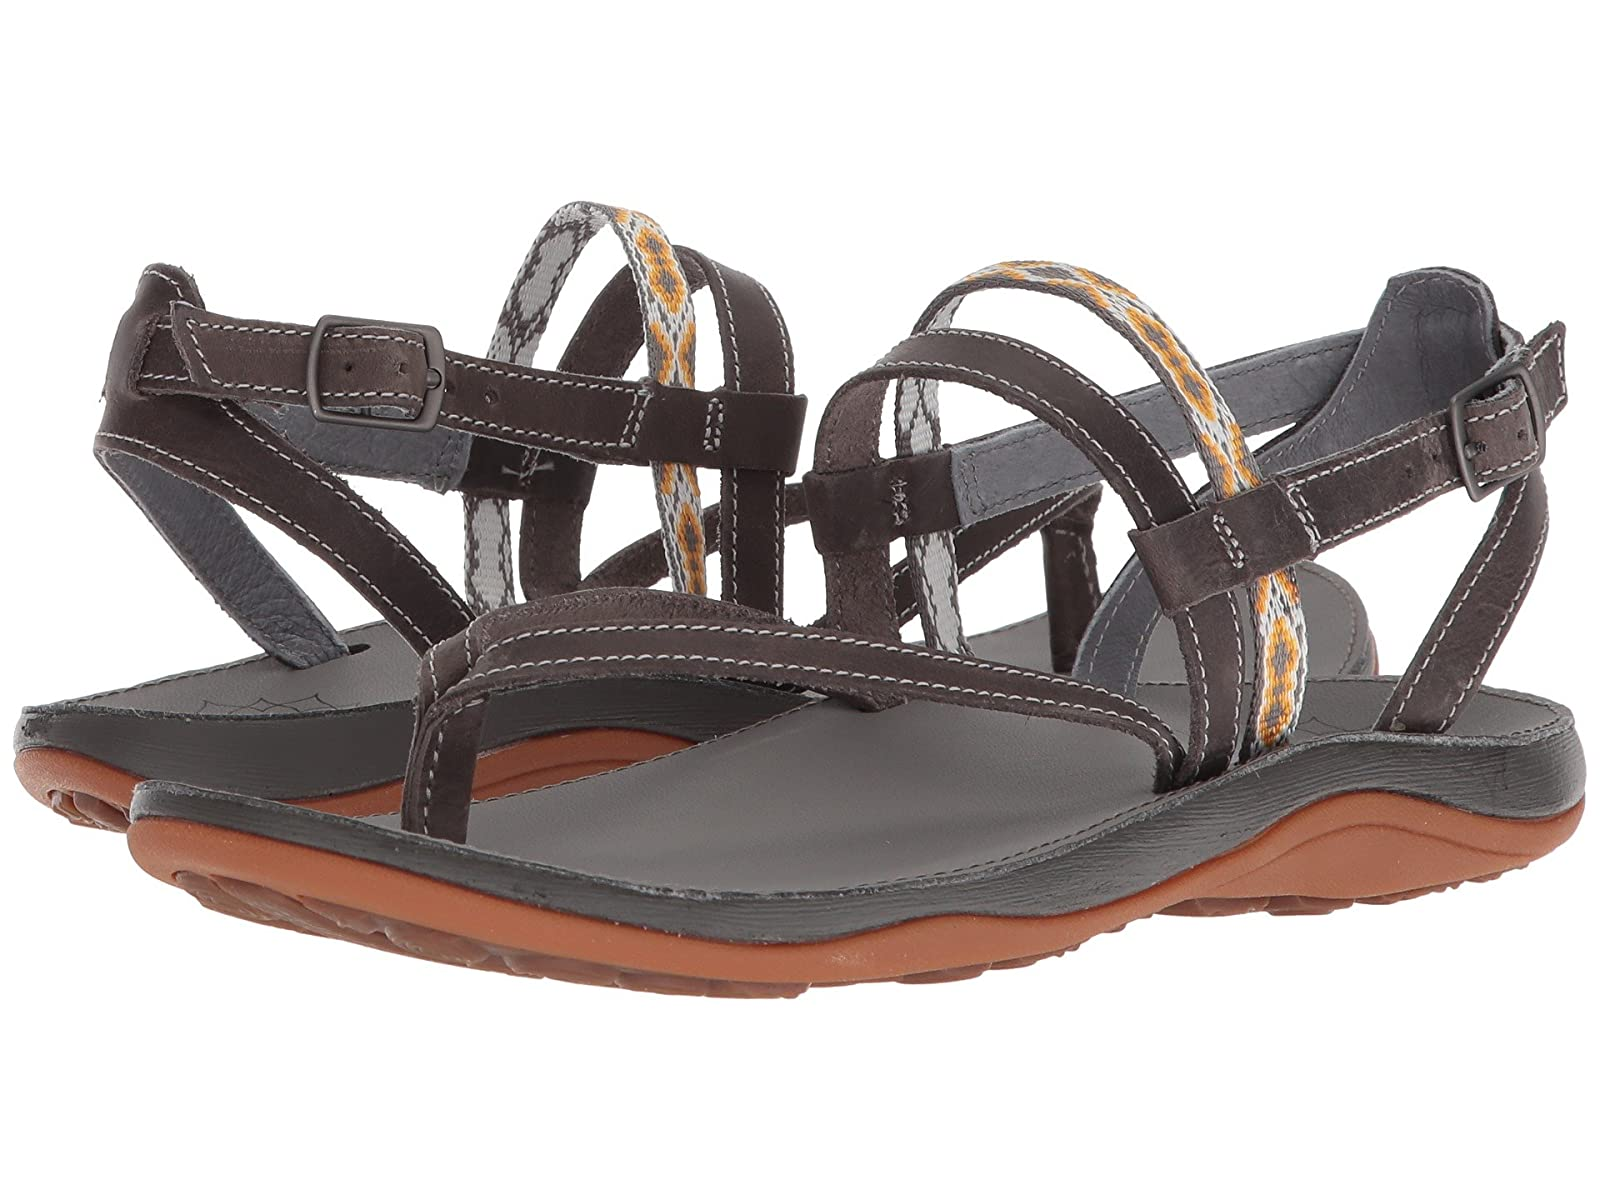 Chaco LovelandComfortable and distinctive shoes